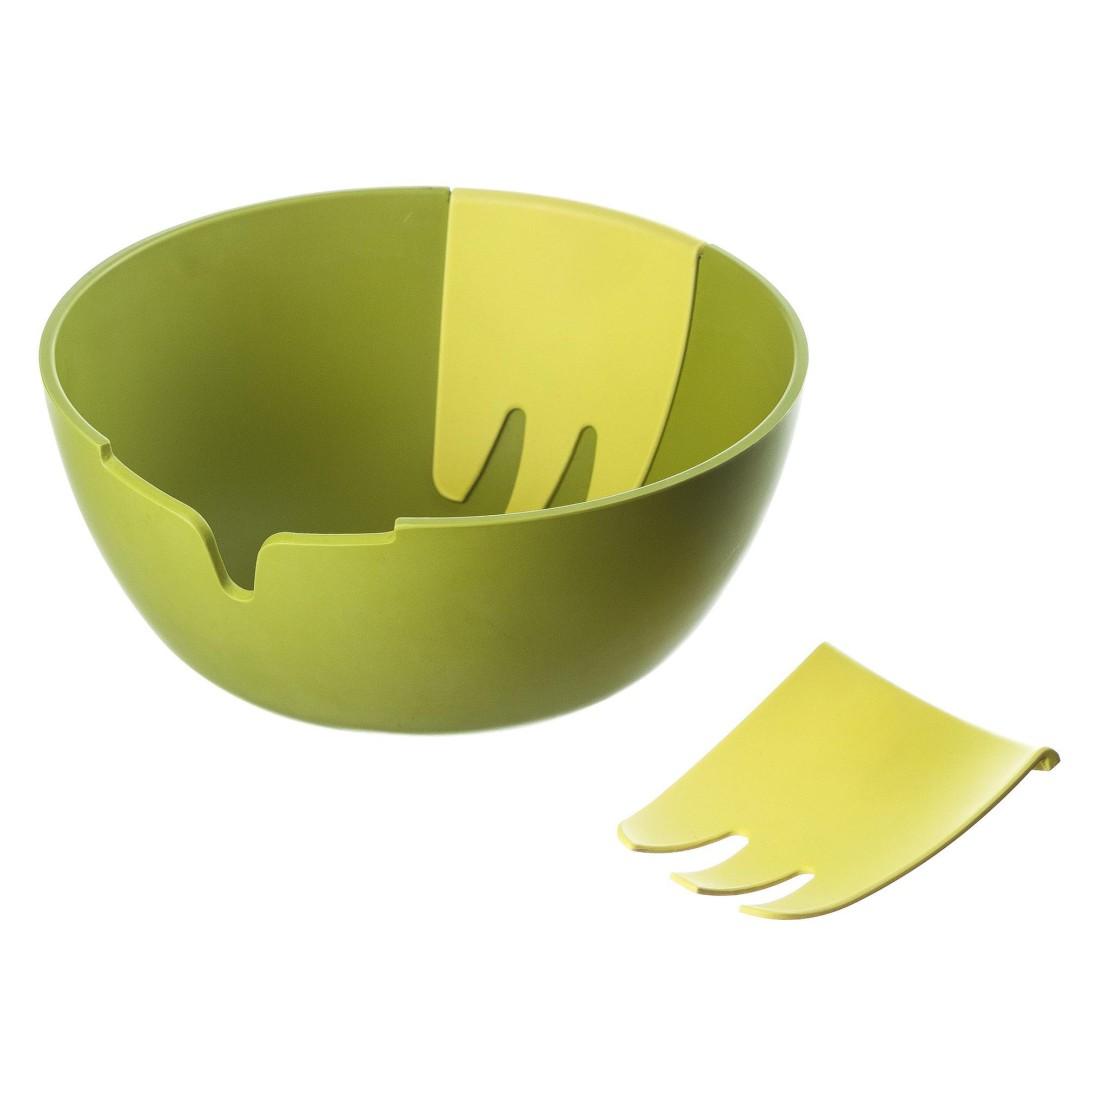 Salatschüssel-Set Hands On – Kunststoff – Grün, JOSEPH JOSEPH kaufen